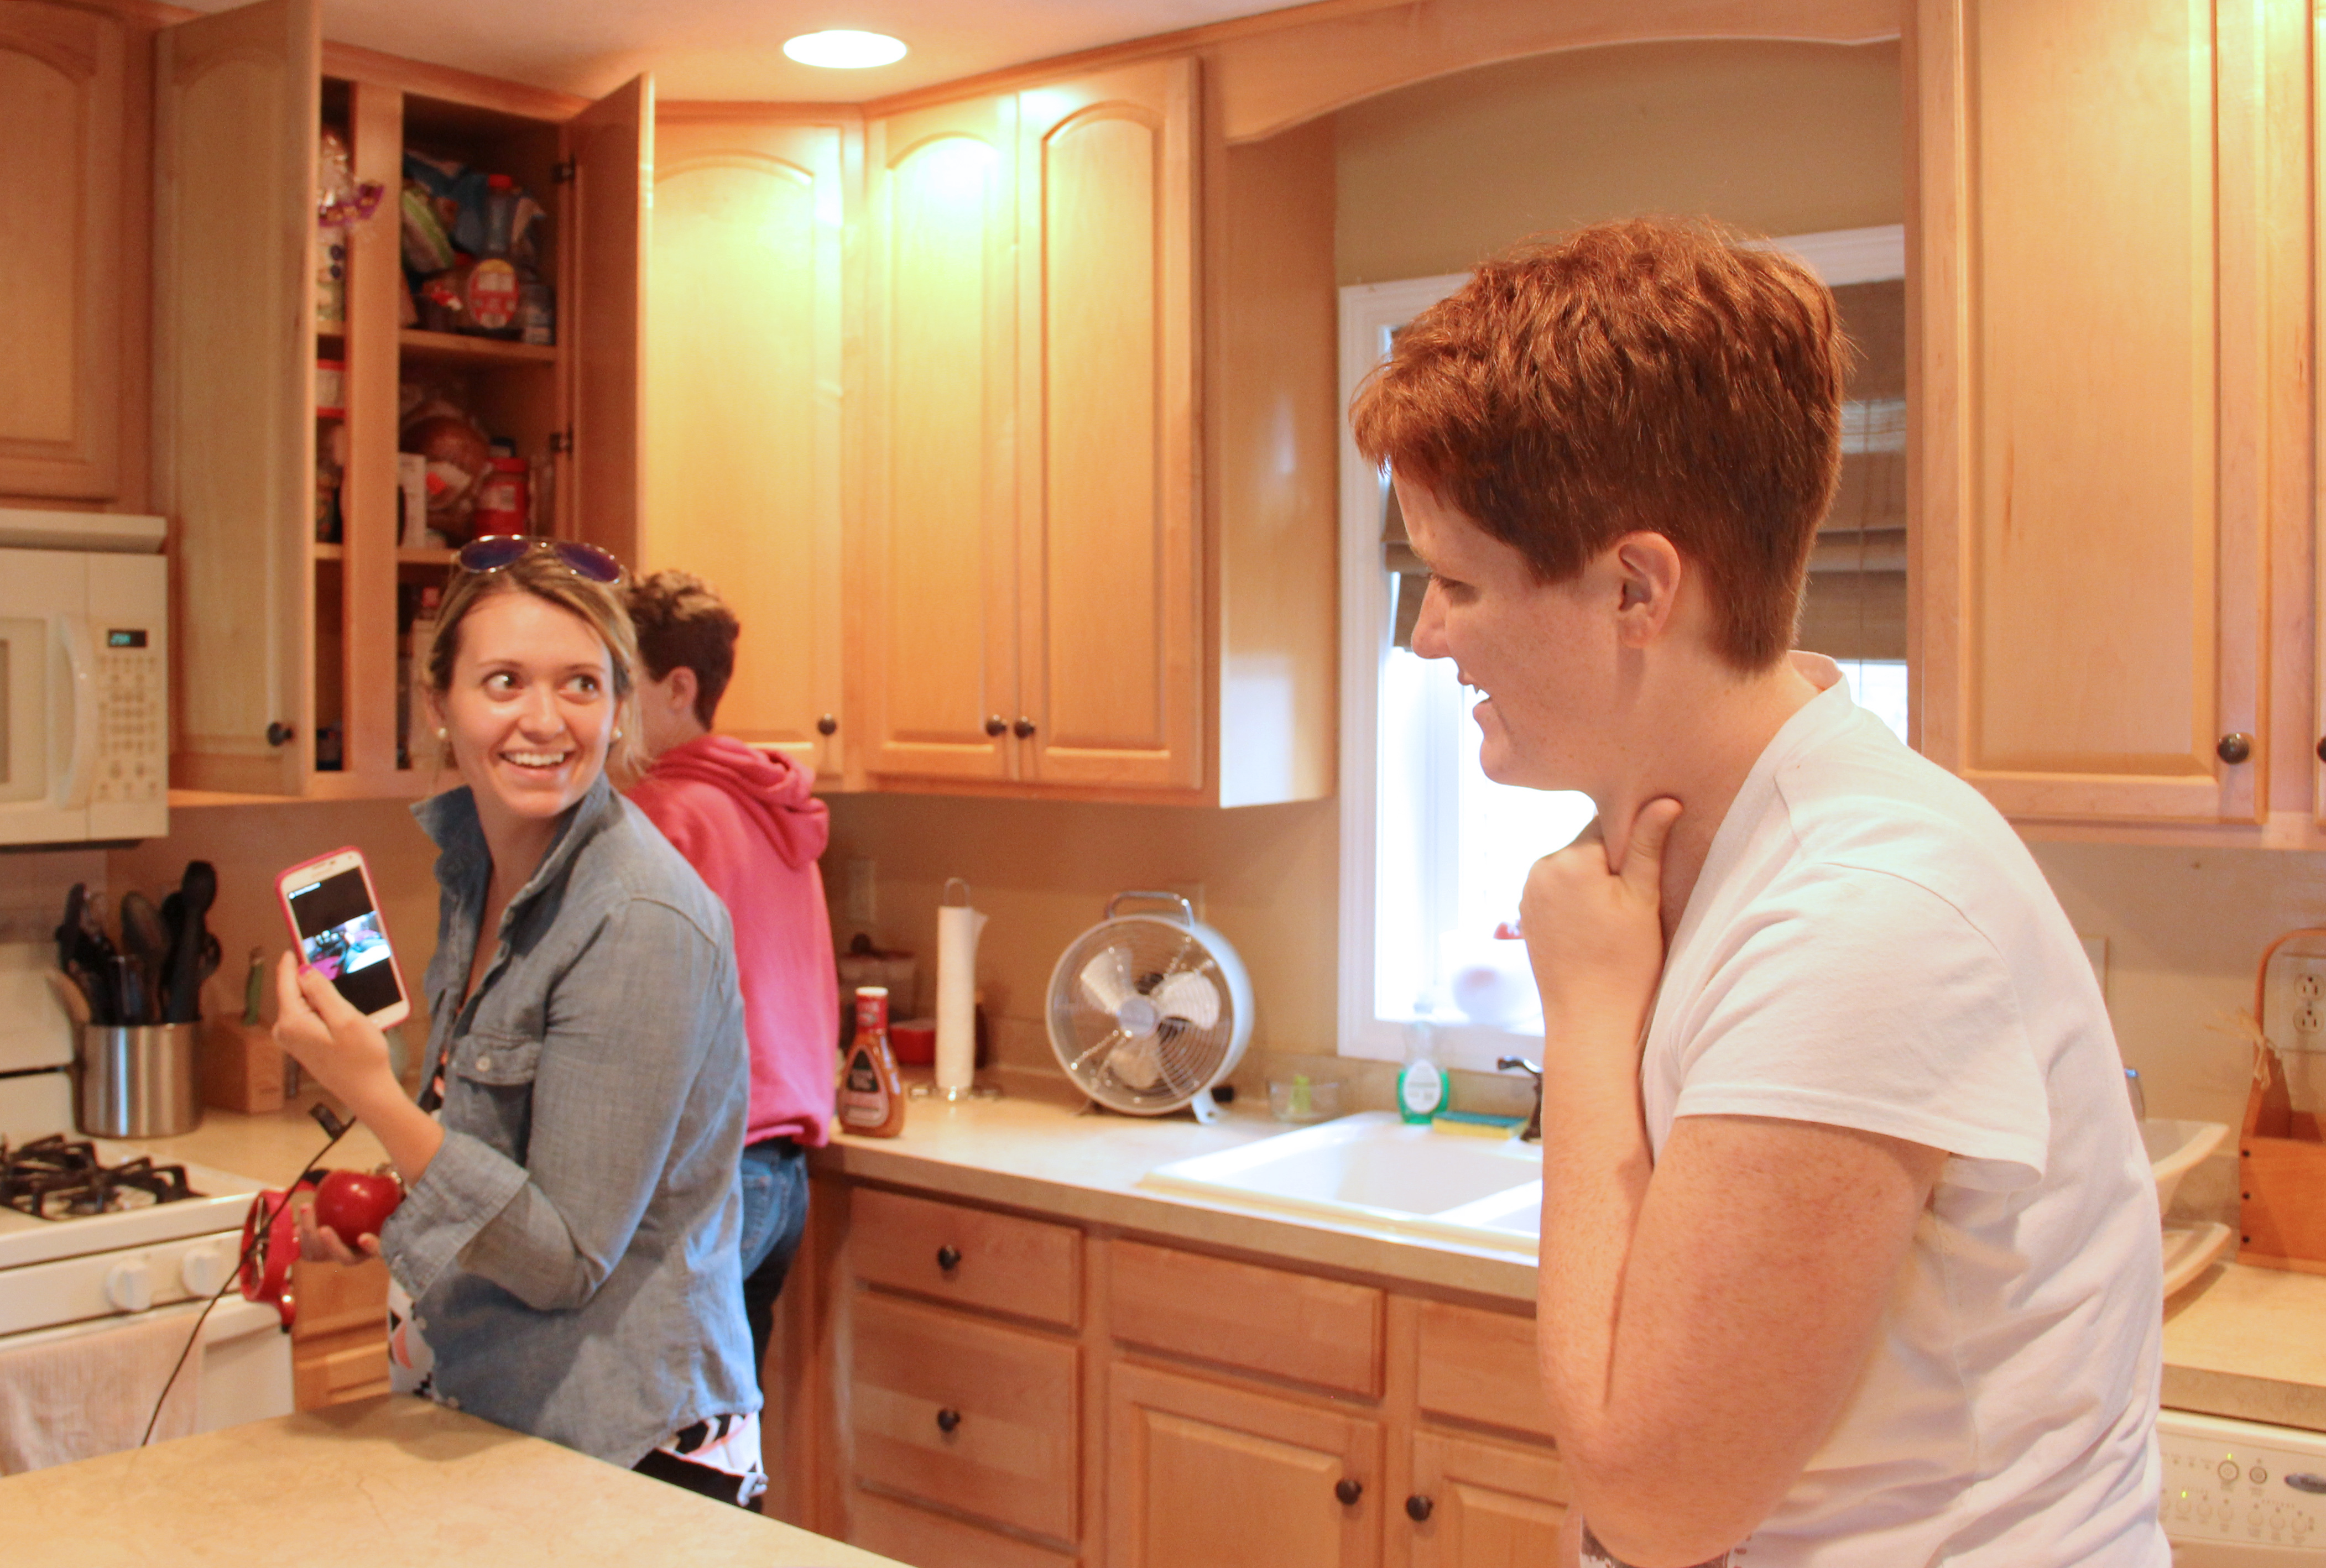 Jill in Kitchen - Housing Navigation